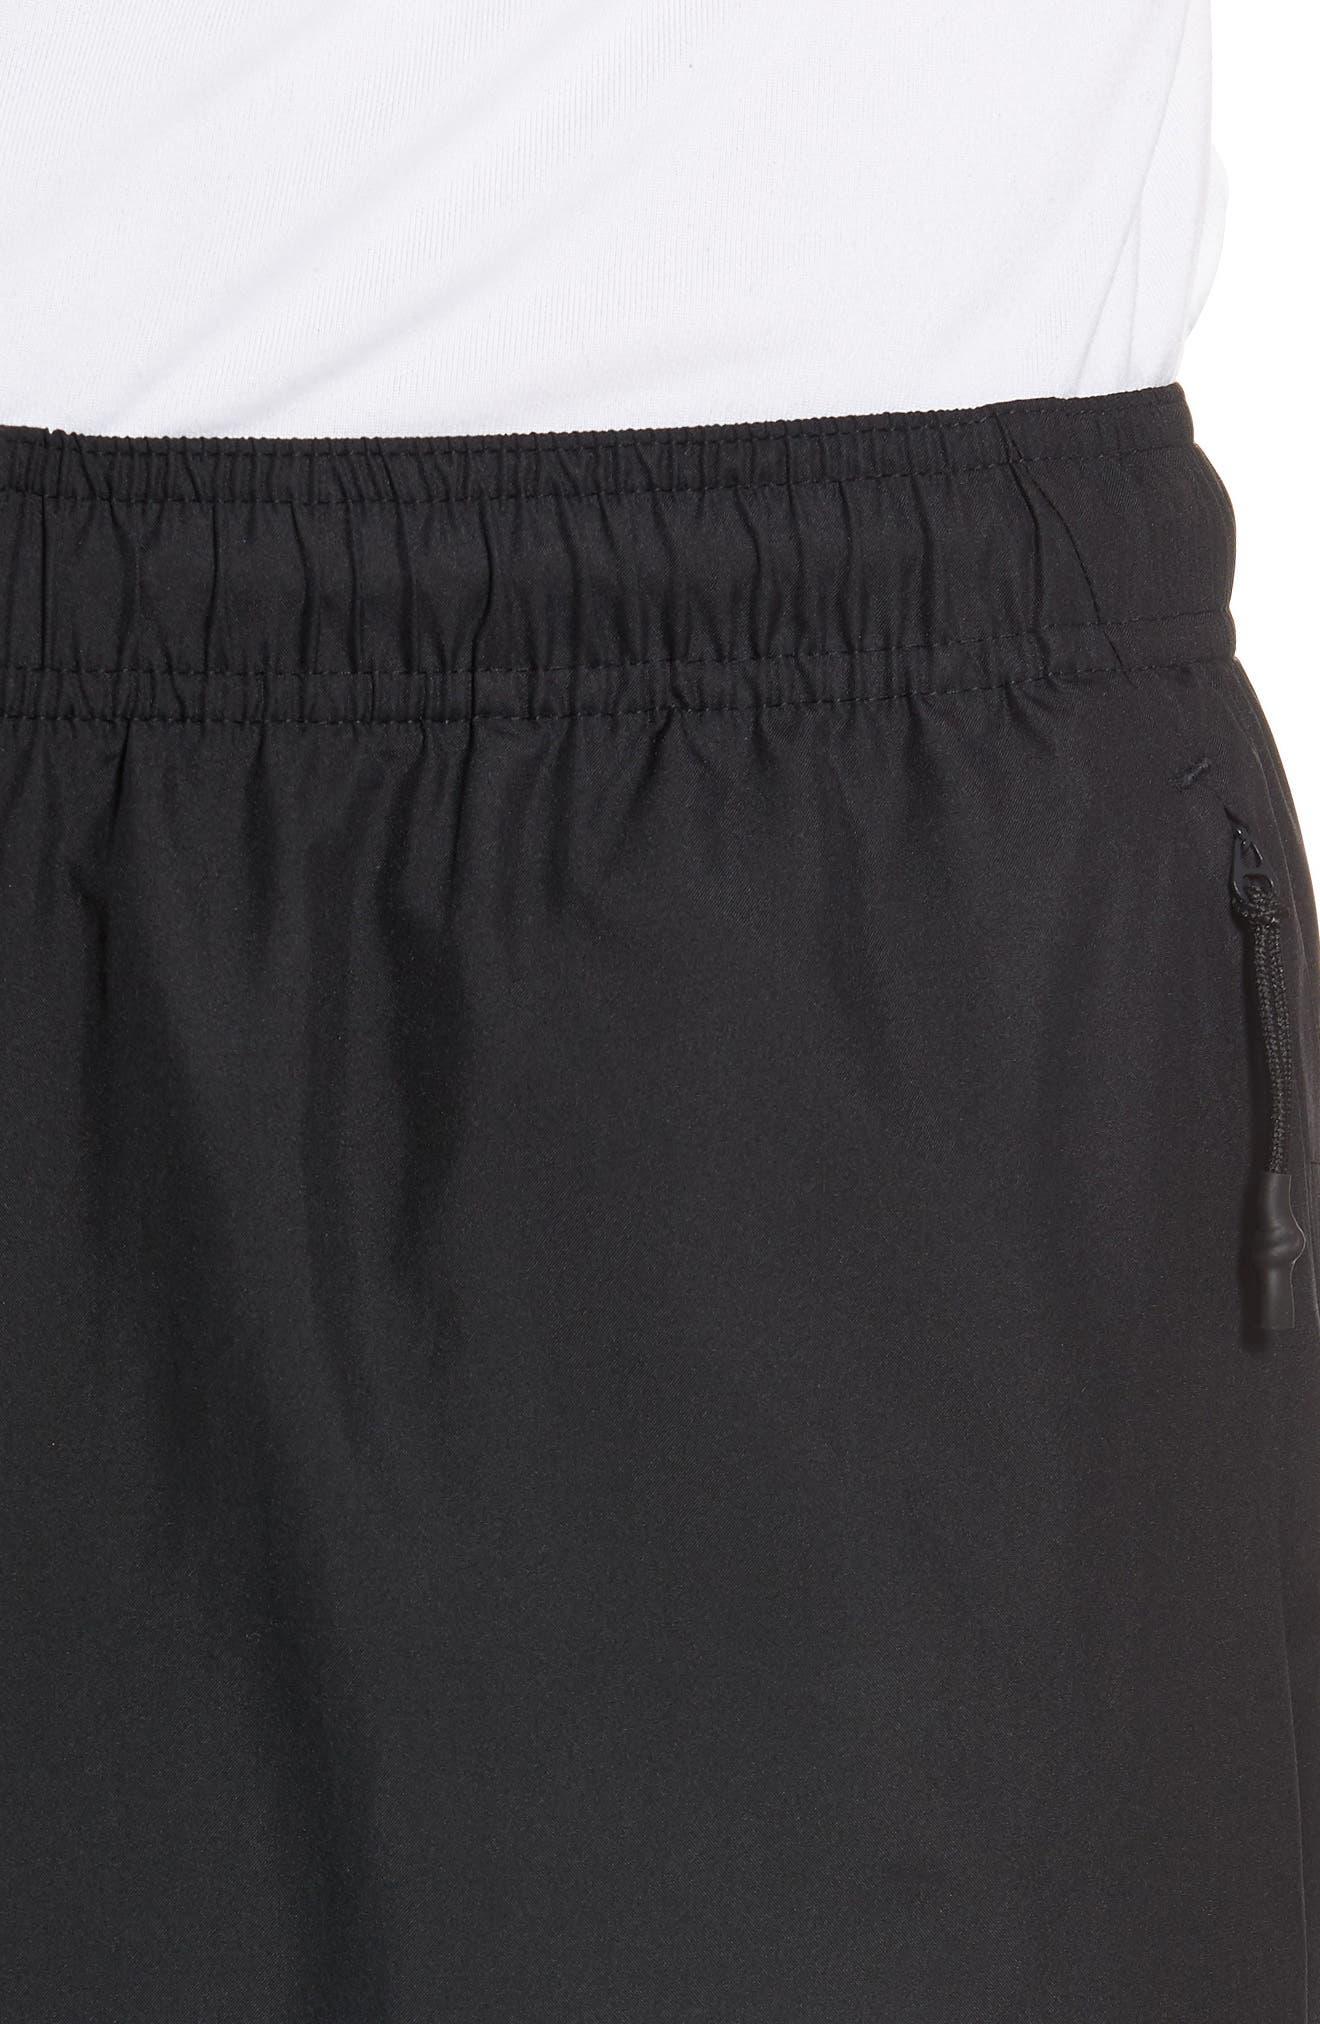 Slim Fit Sweatpants,                             Alternate thumbnail 4, color,                             Black